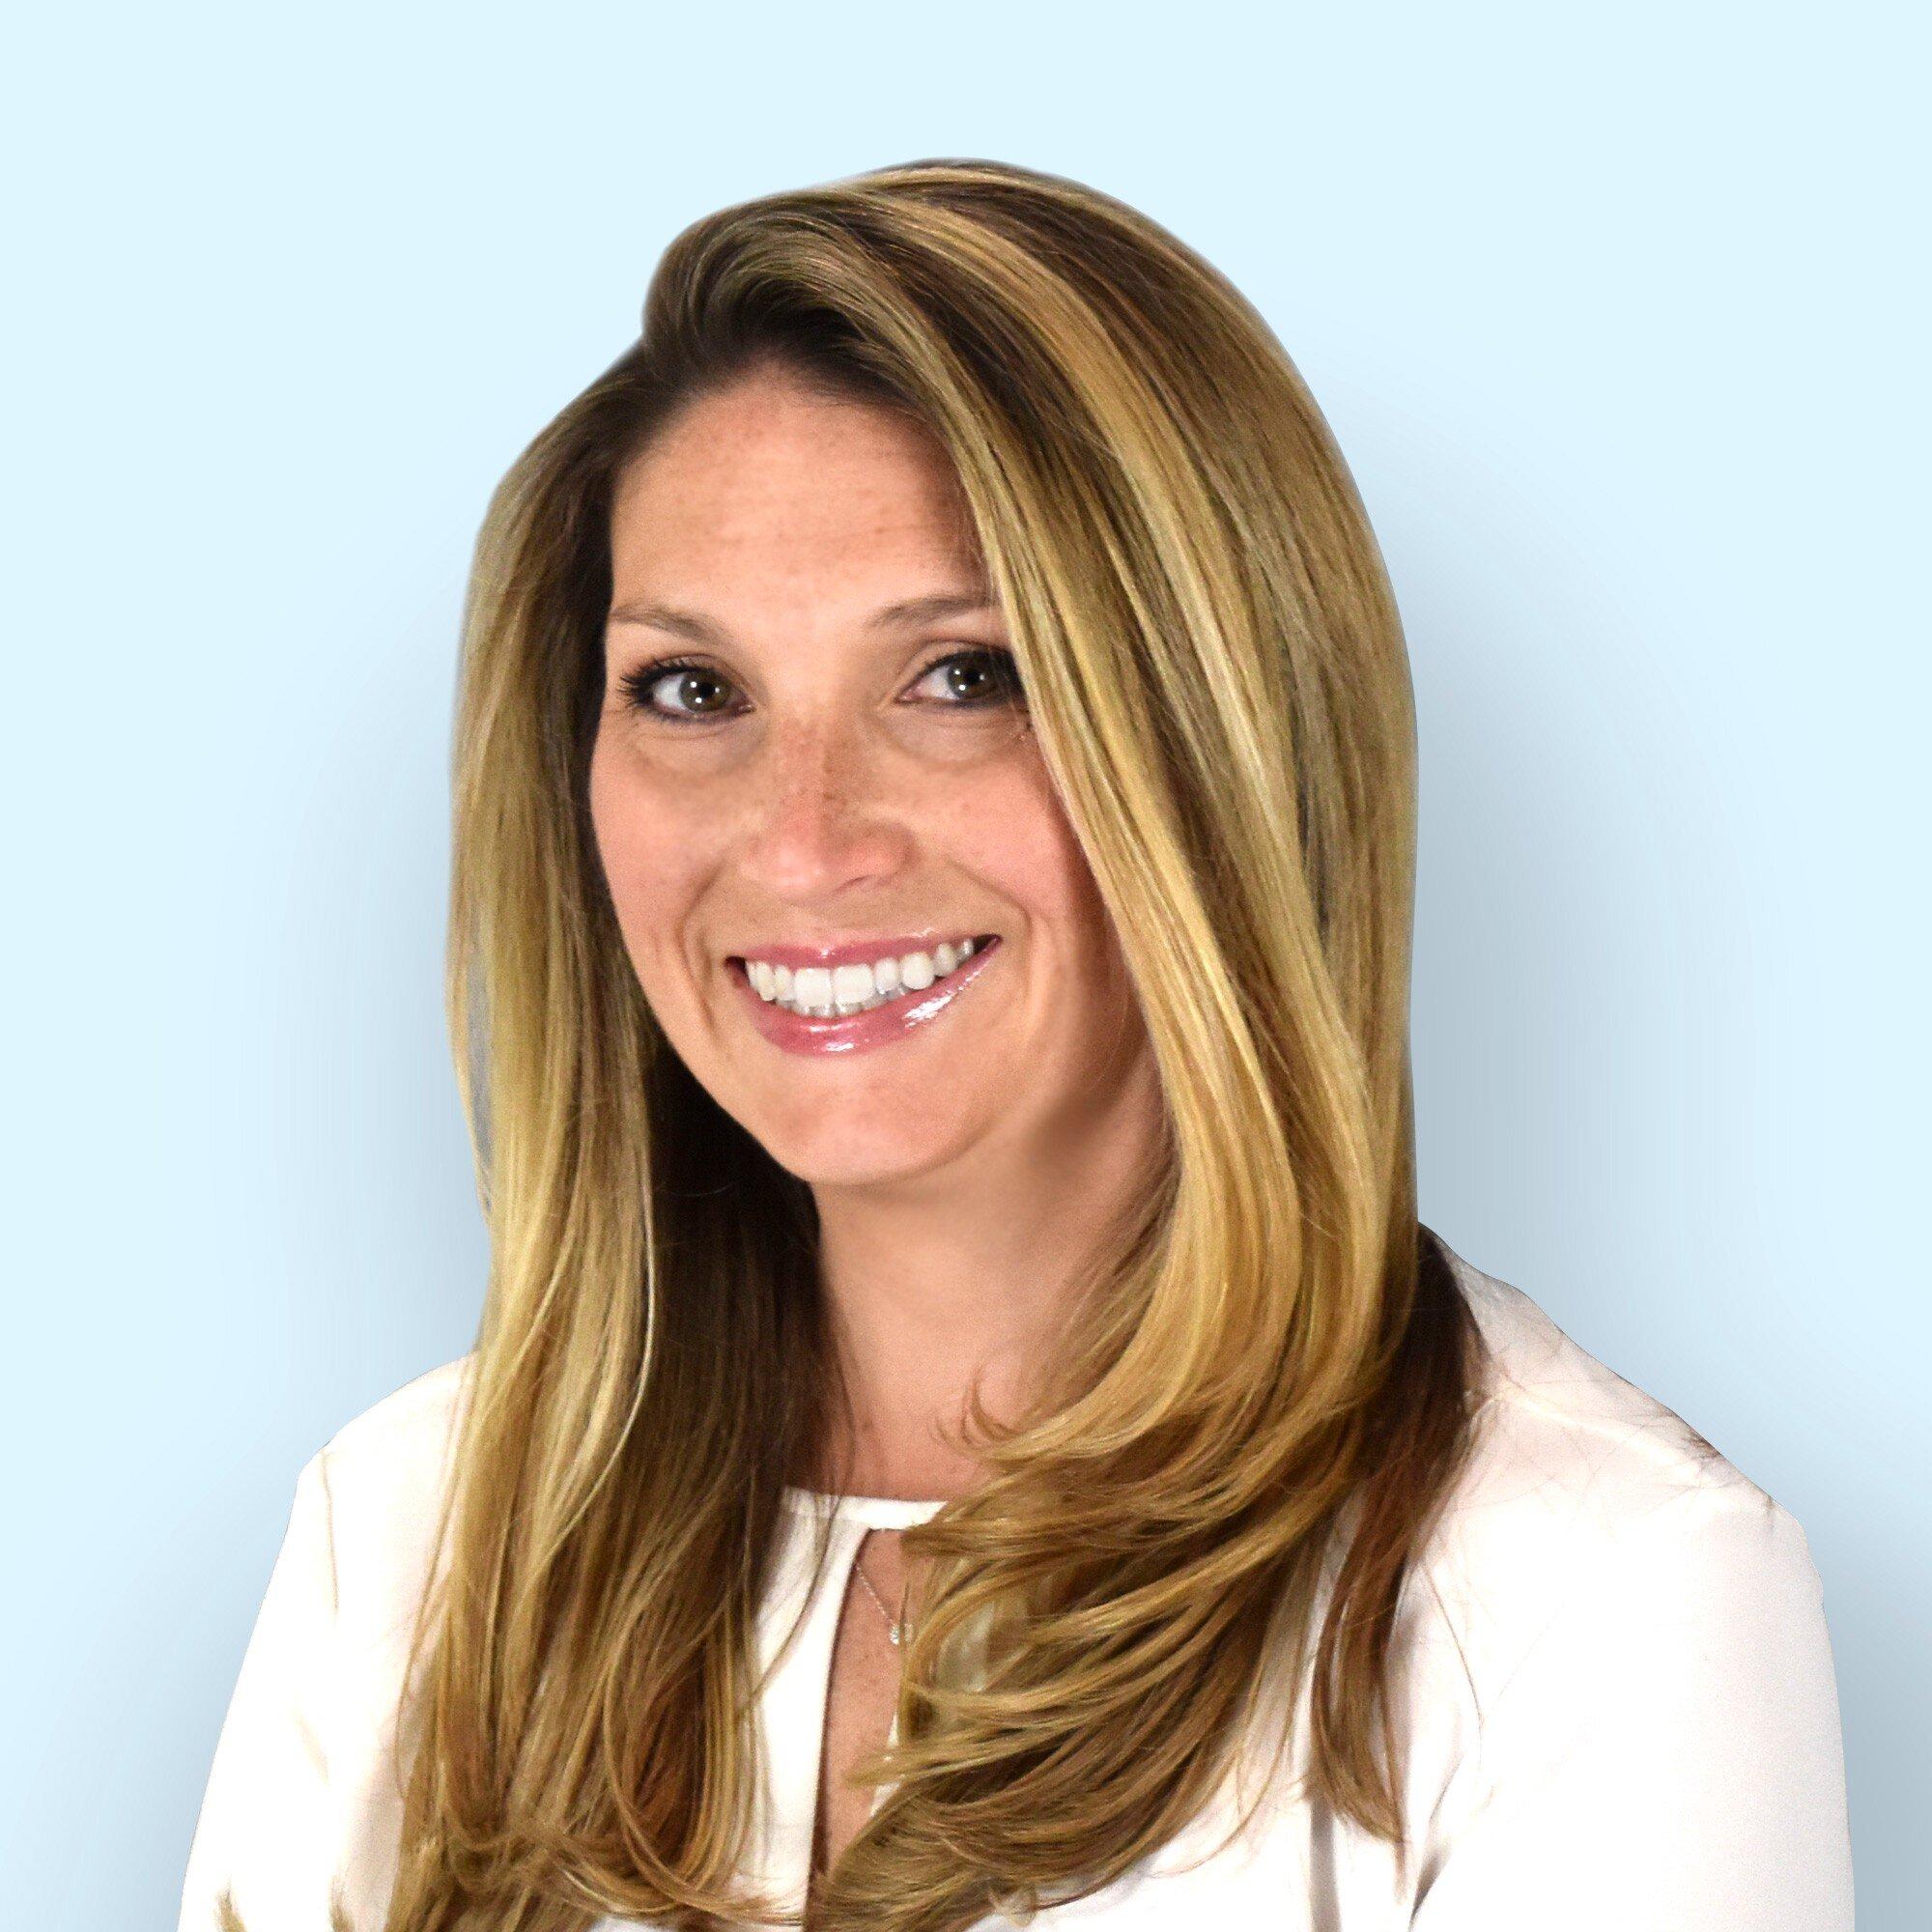 Melanie D'Arrigo is a Democratic candidate for Congress in New York's Third Congressional District. Photo courtesy of Melanie D'Arrigo